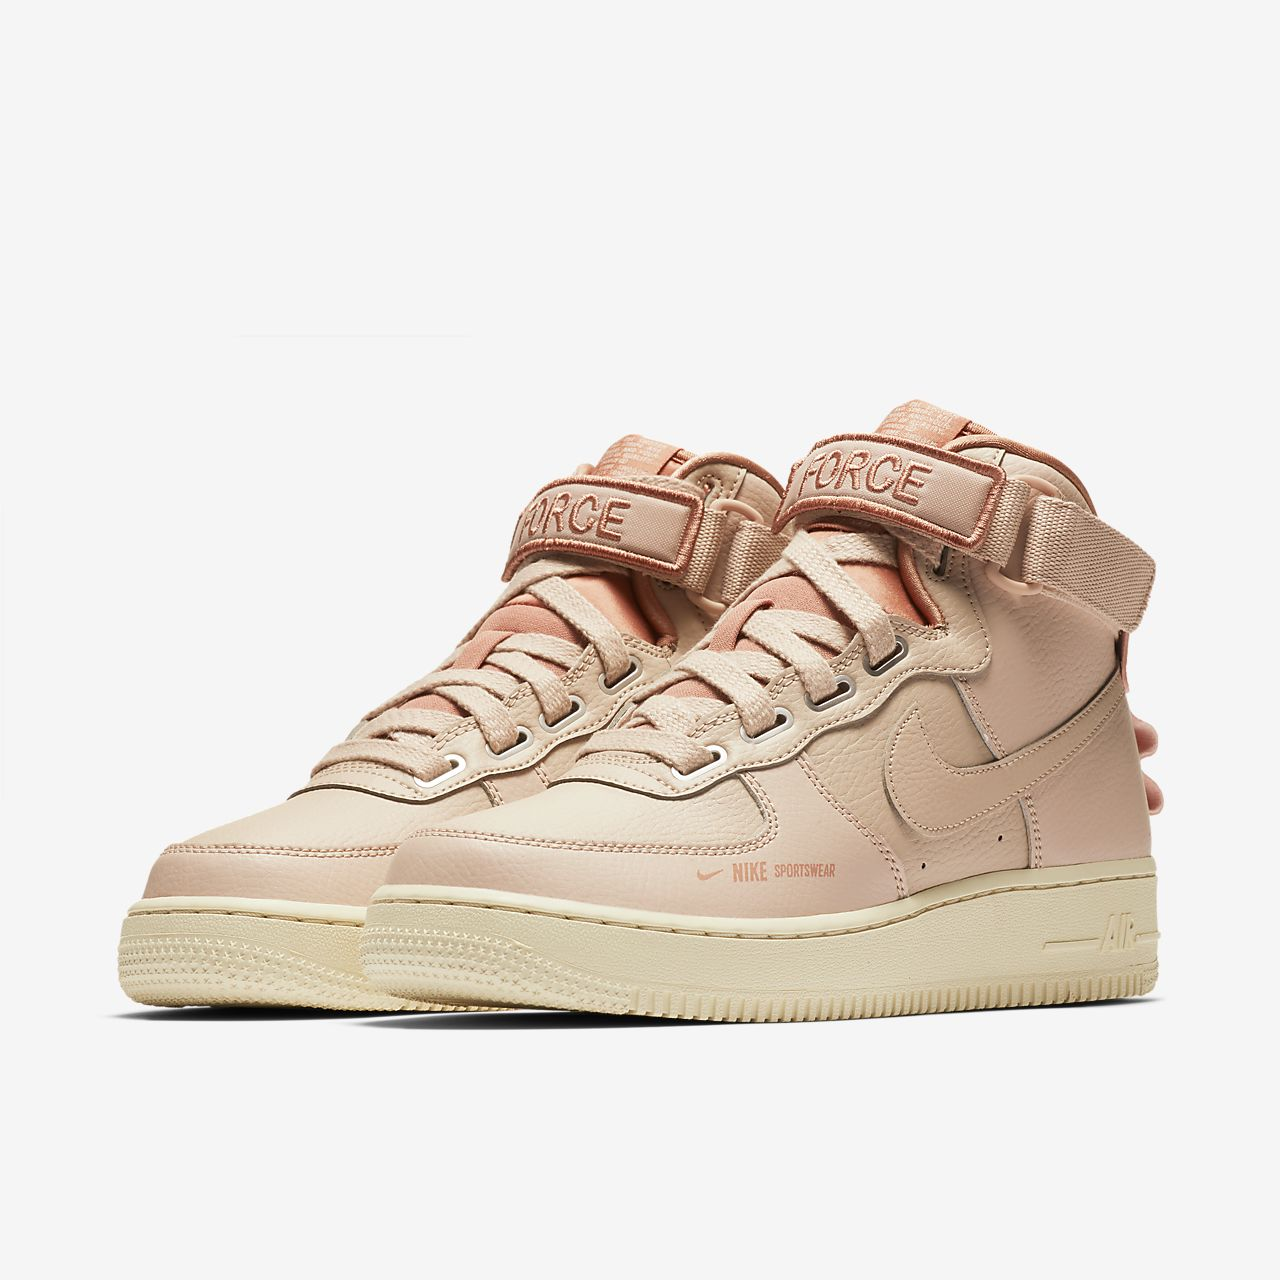 e45c4def2a5ff2 Nike Air Force 1 High Utility Women s Shoe. Nike.com CA